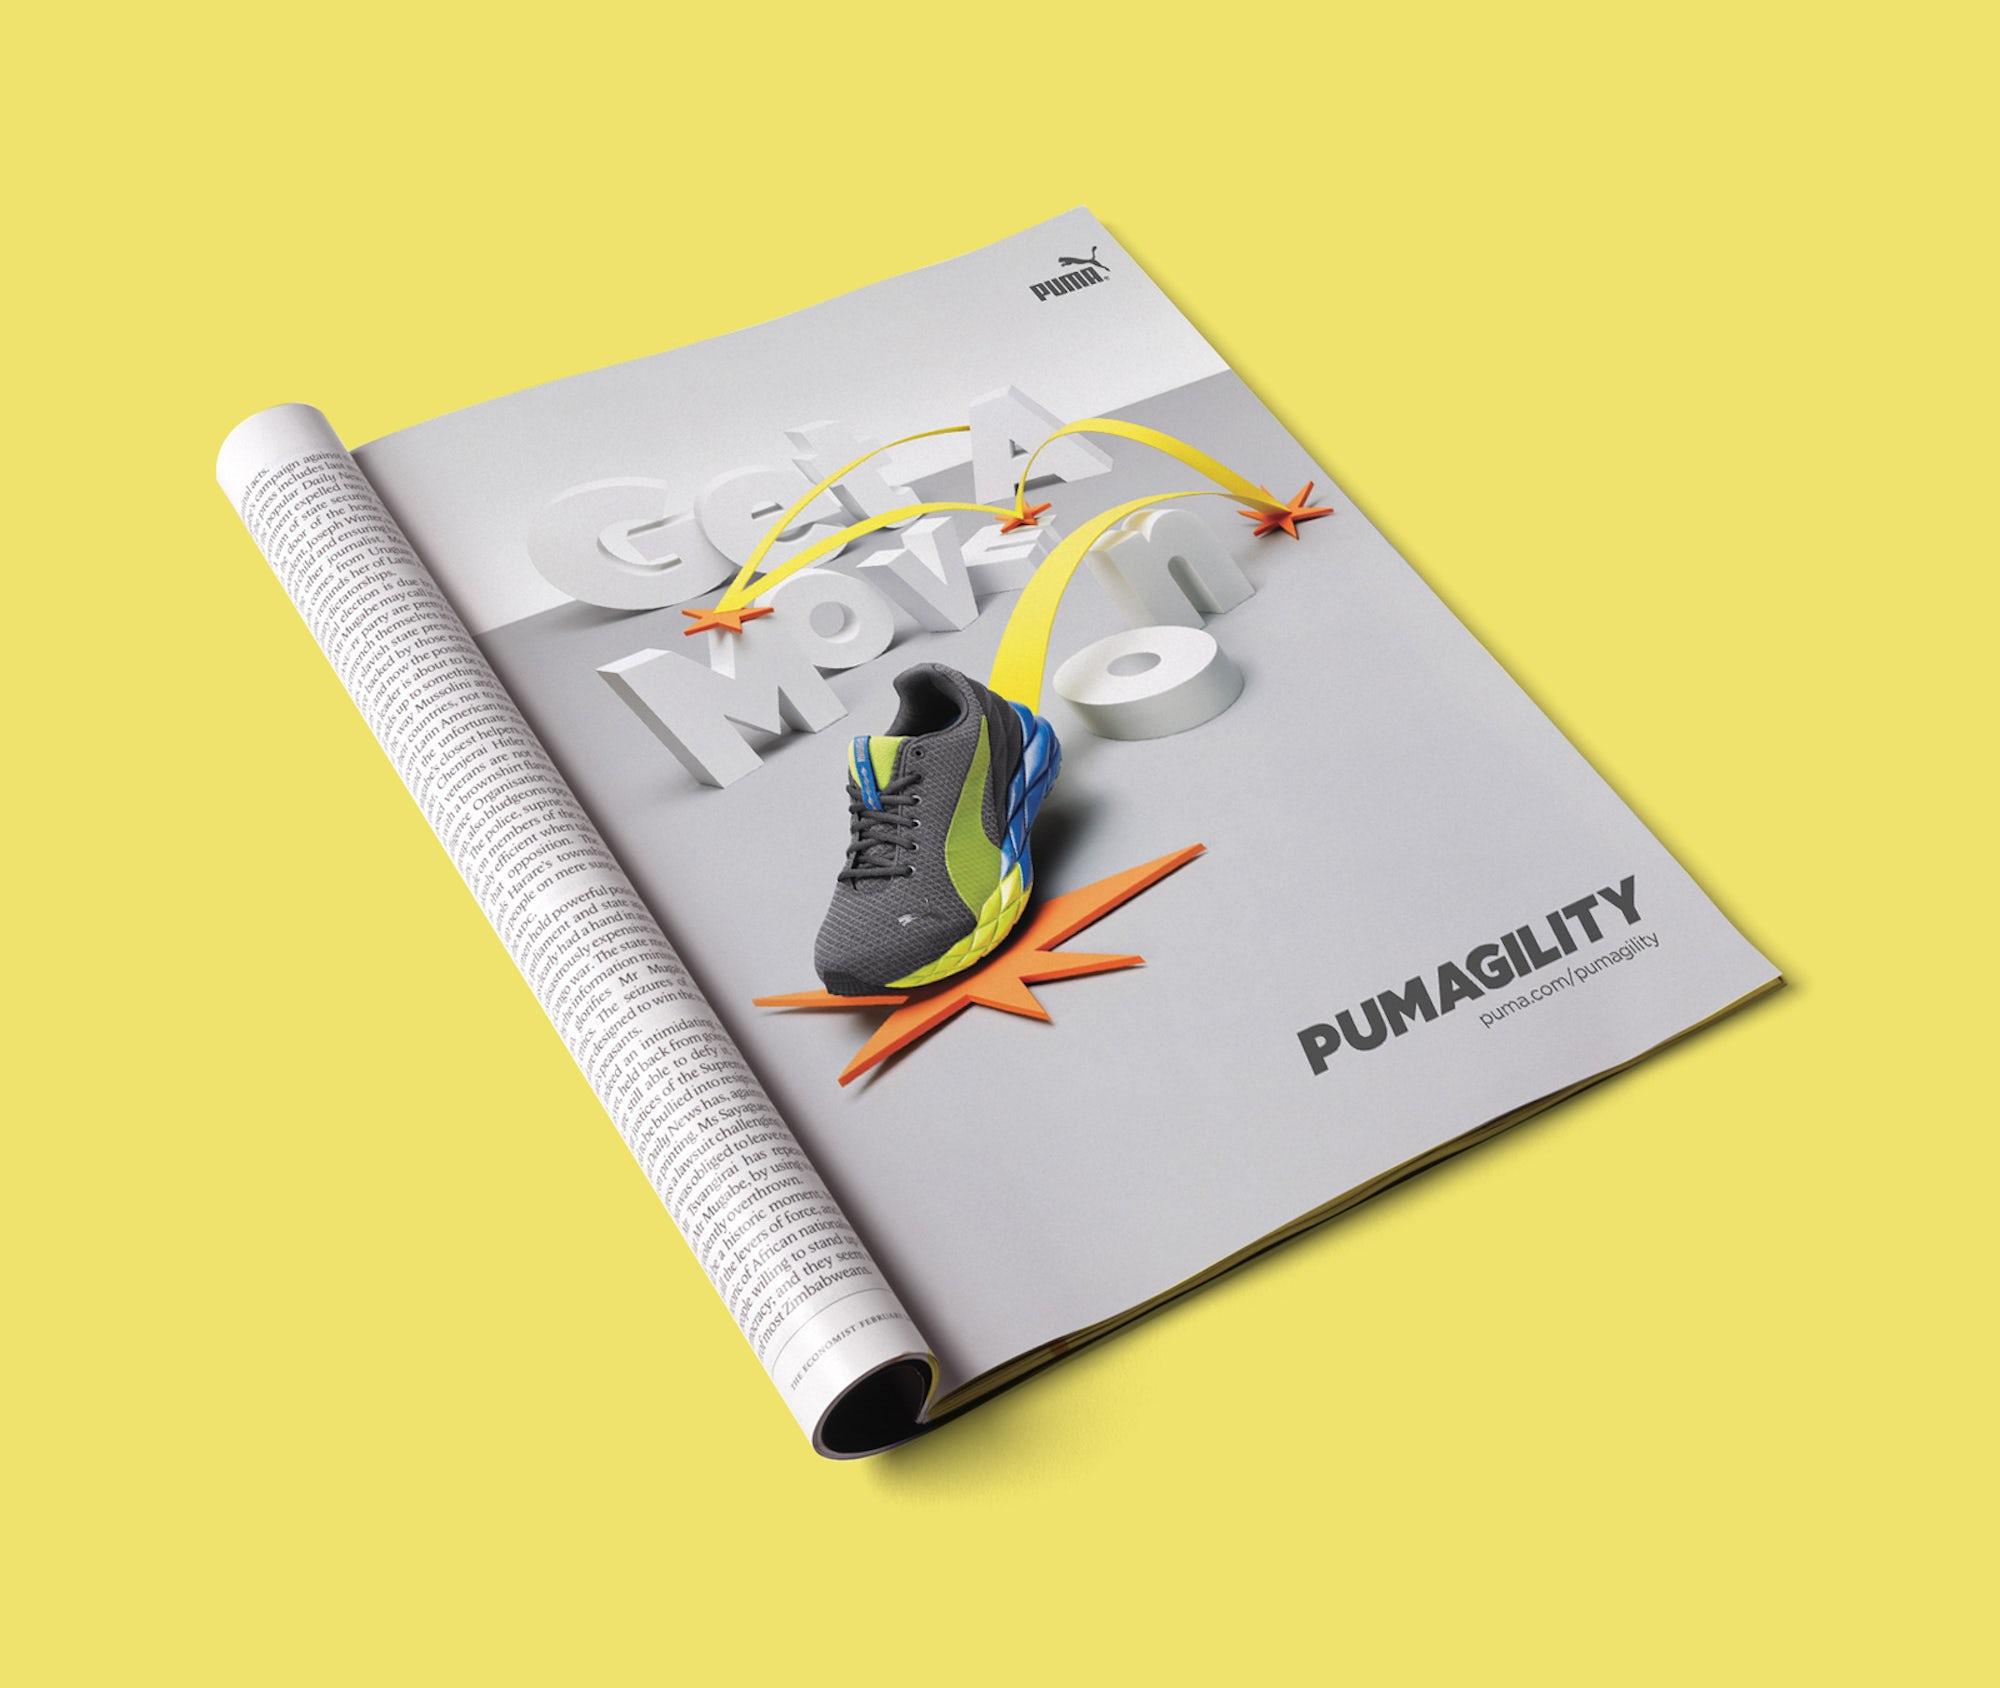 PUMAGILITY Ad Campaign Design for PUMA